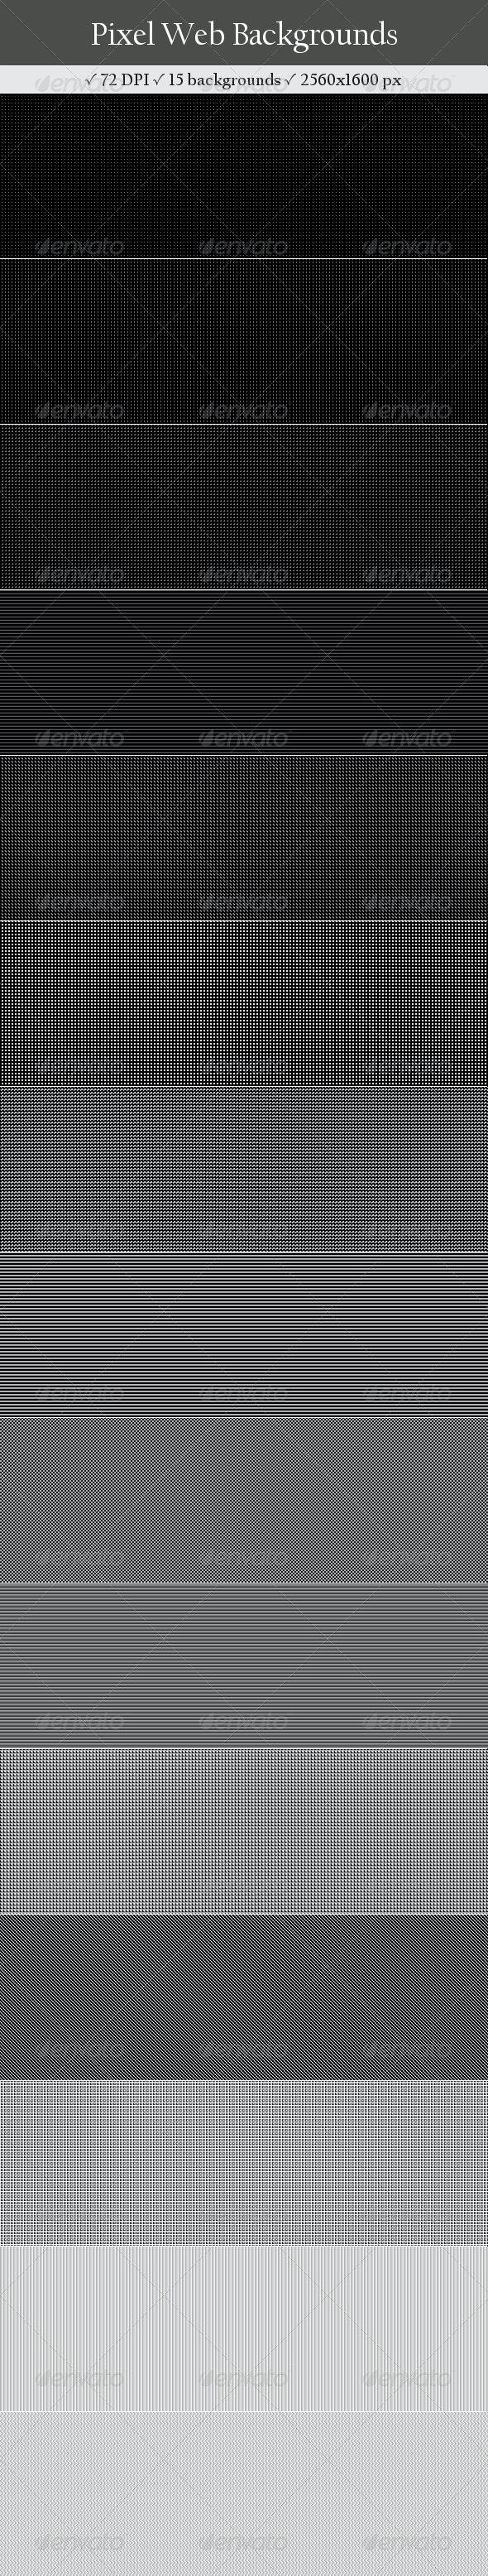 15 Pixel Web Backgrounds - Backgrounds Graphics